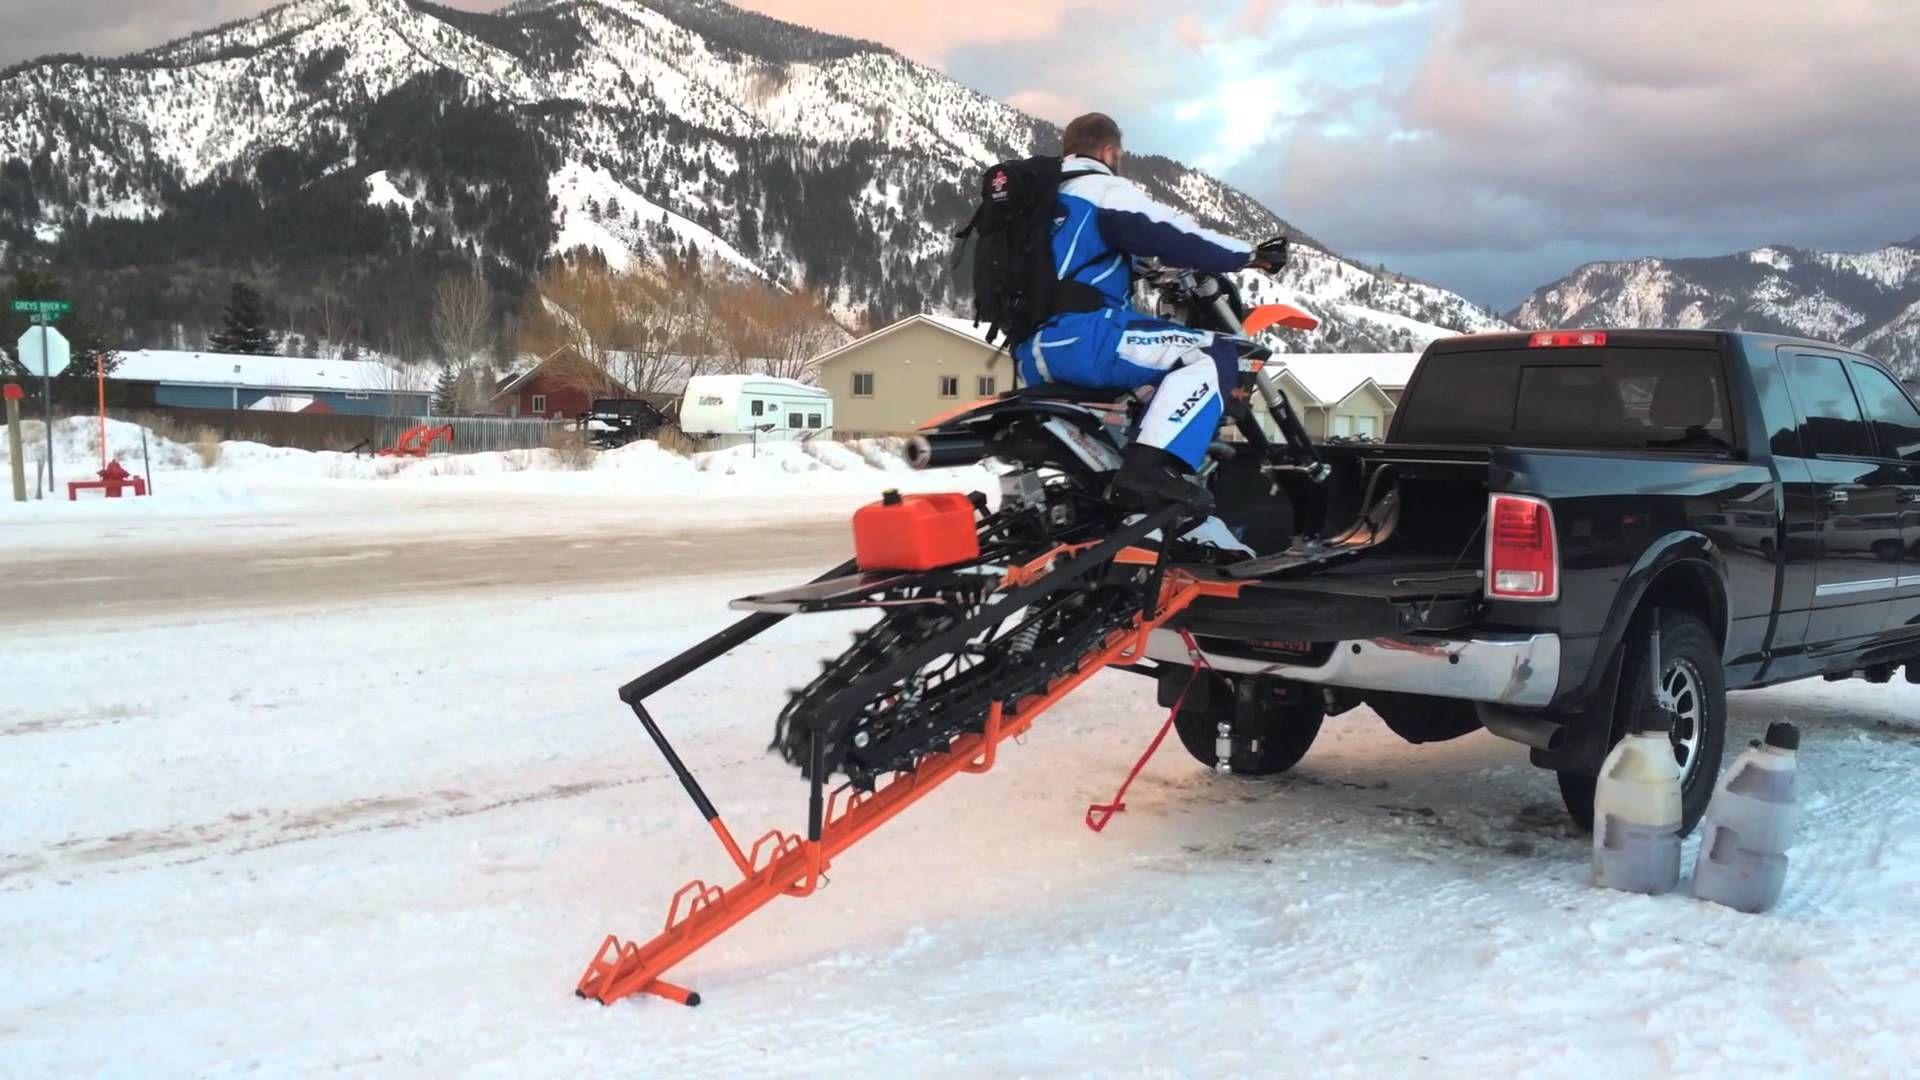 Snowest Test The Spine Snow Bike Ramp Motorcycles Pinterest